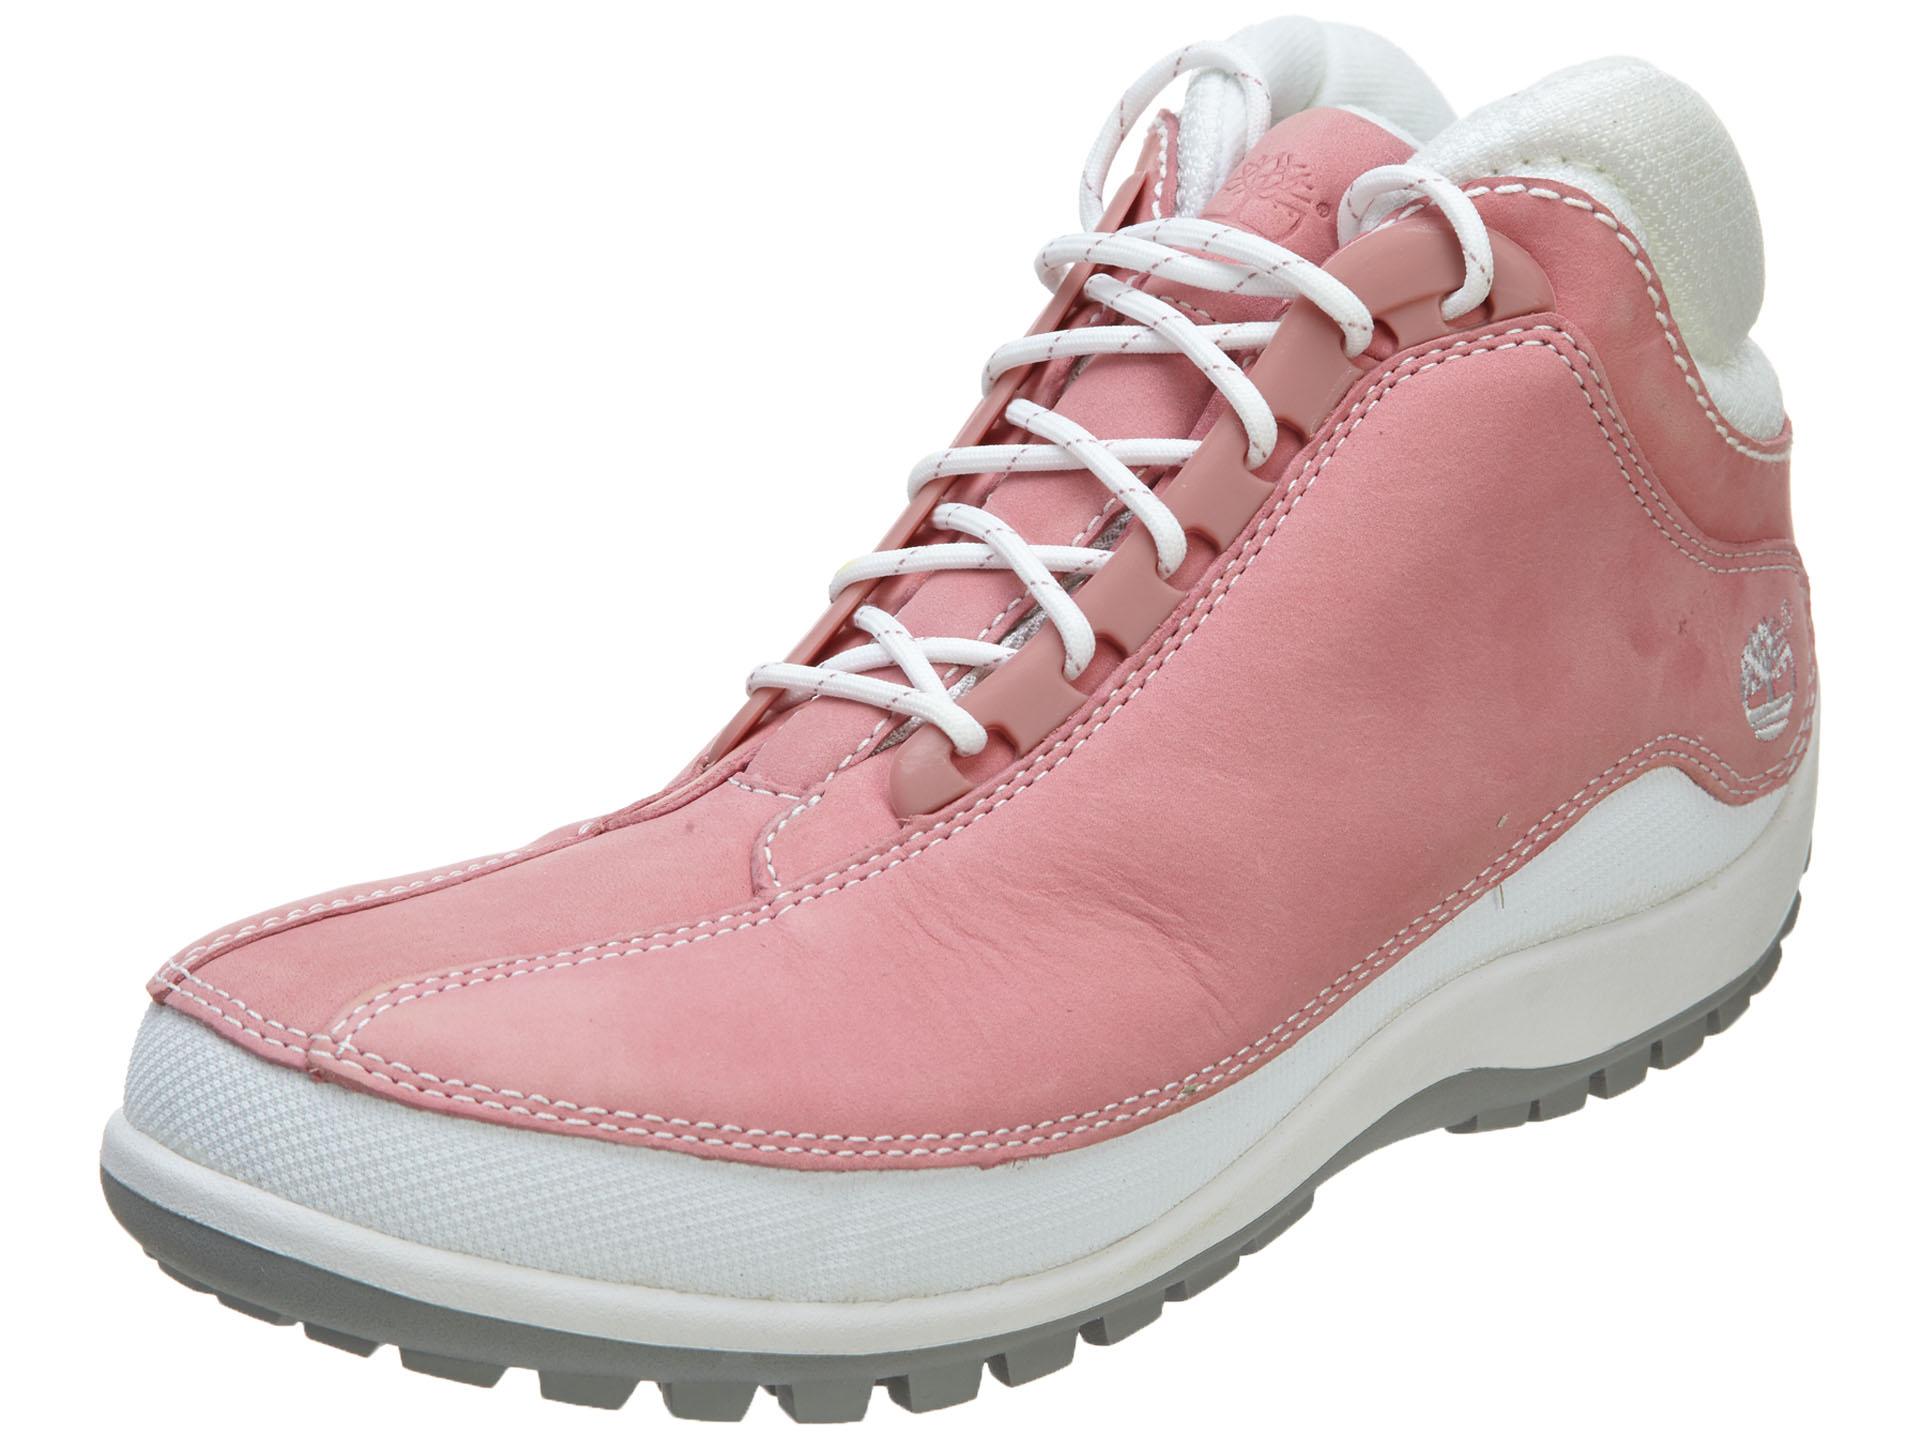 Timberland Talus Boots Big Kids Style # 86993 by